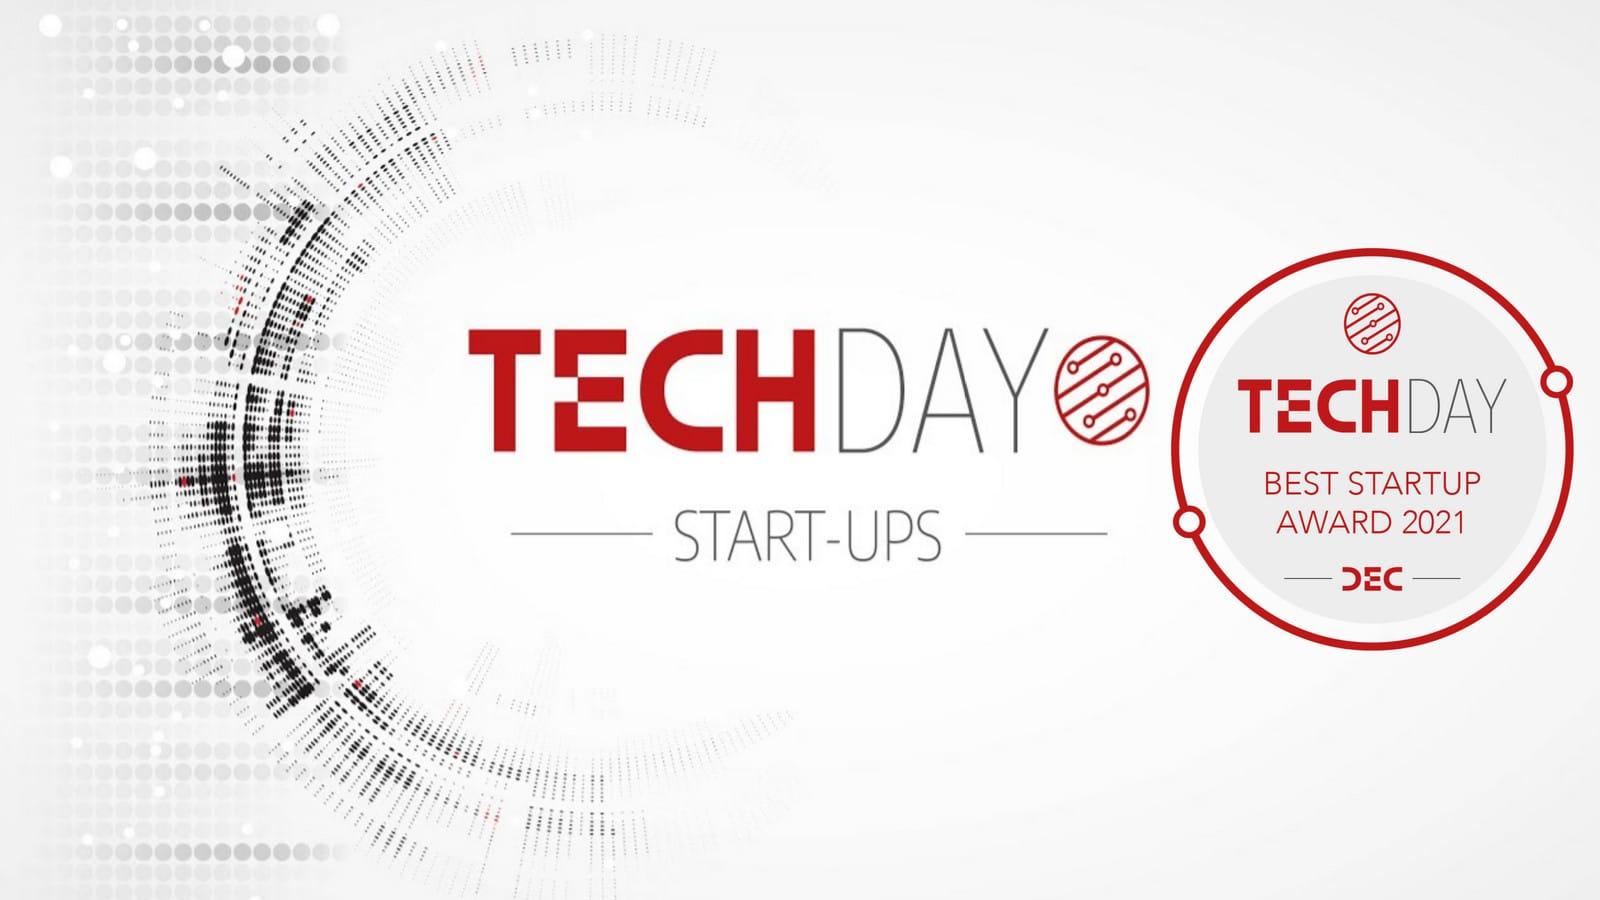 CX_Tech_Day_2021_Award_Behavioral_Signals